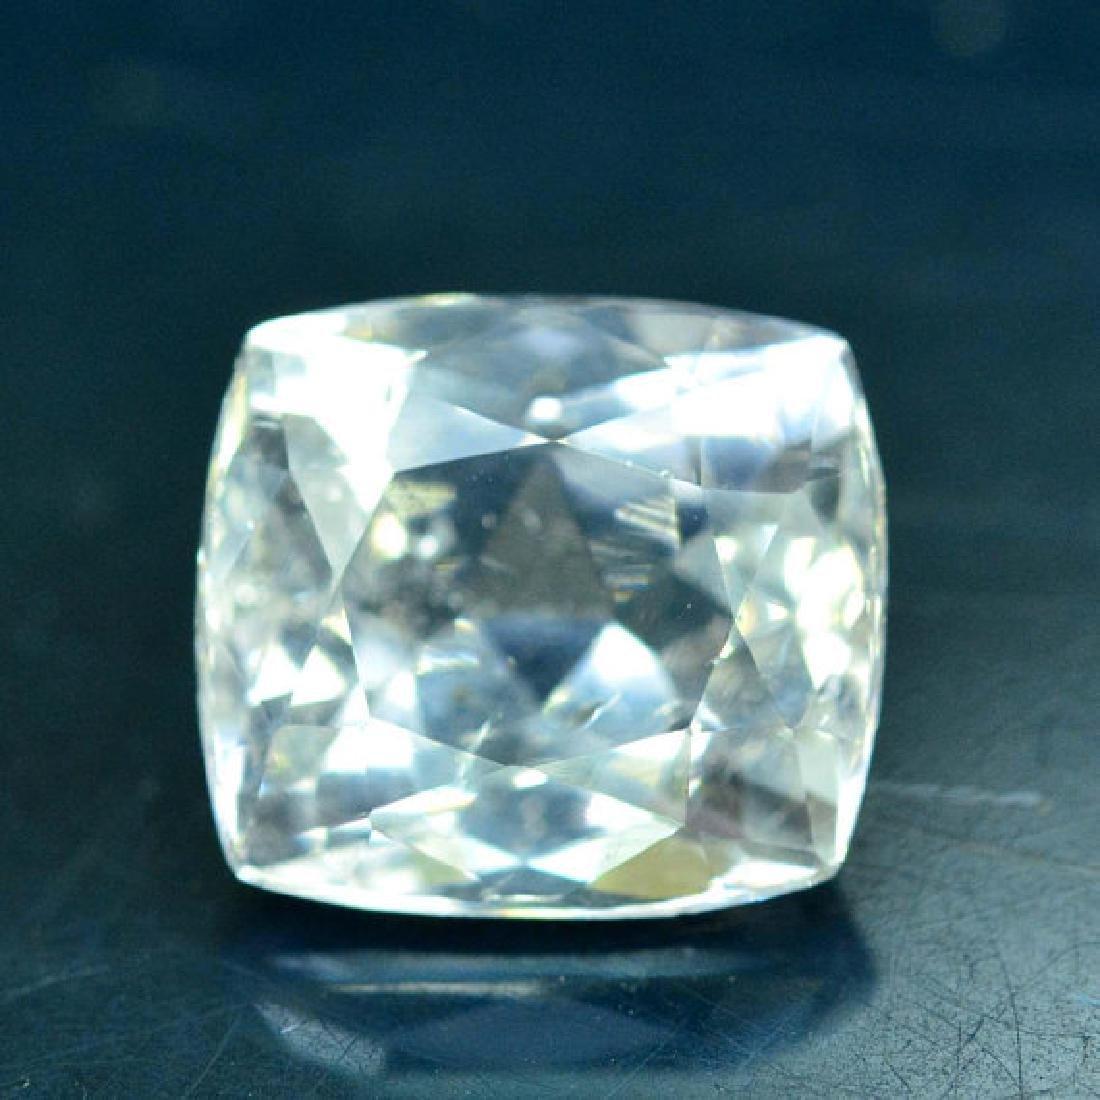 3.55 carats light peach pink Natural Morganite Loose - 3